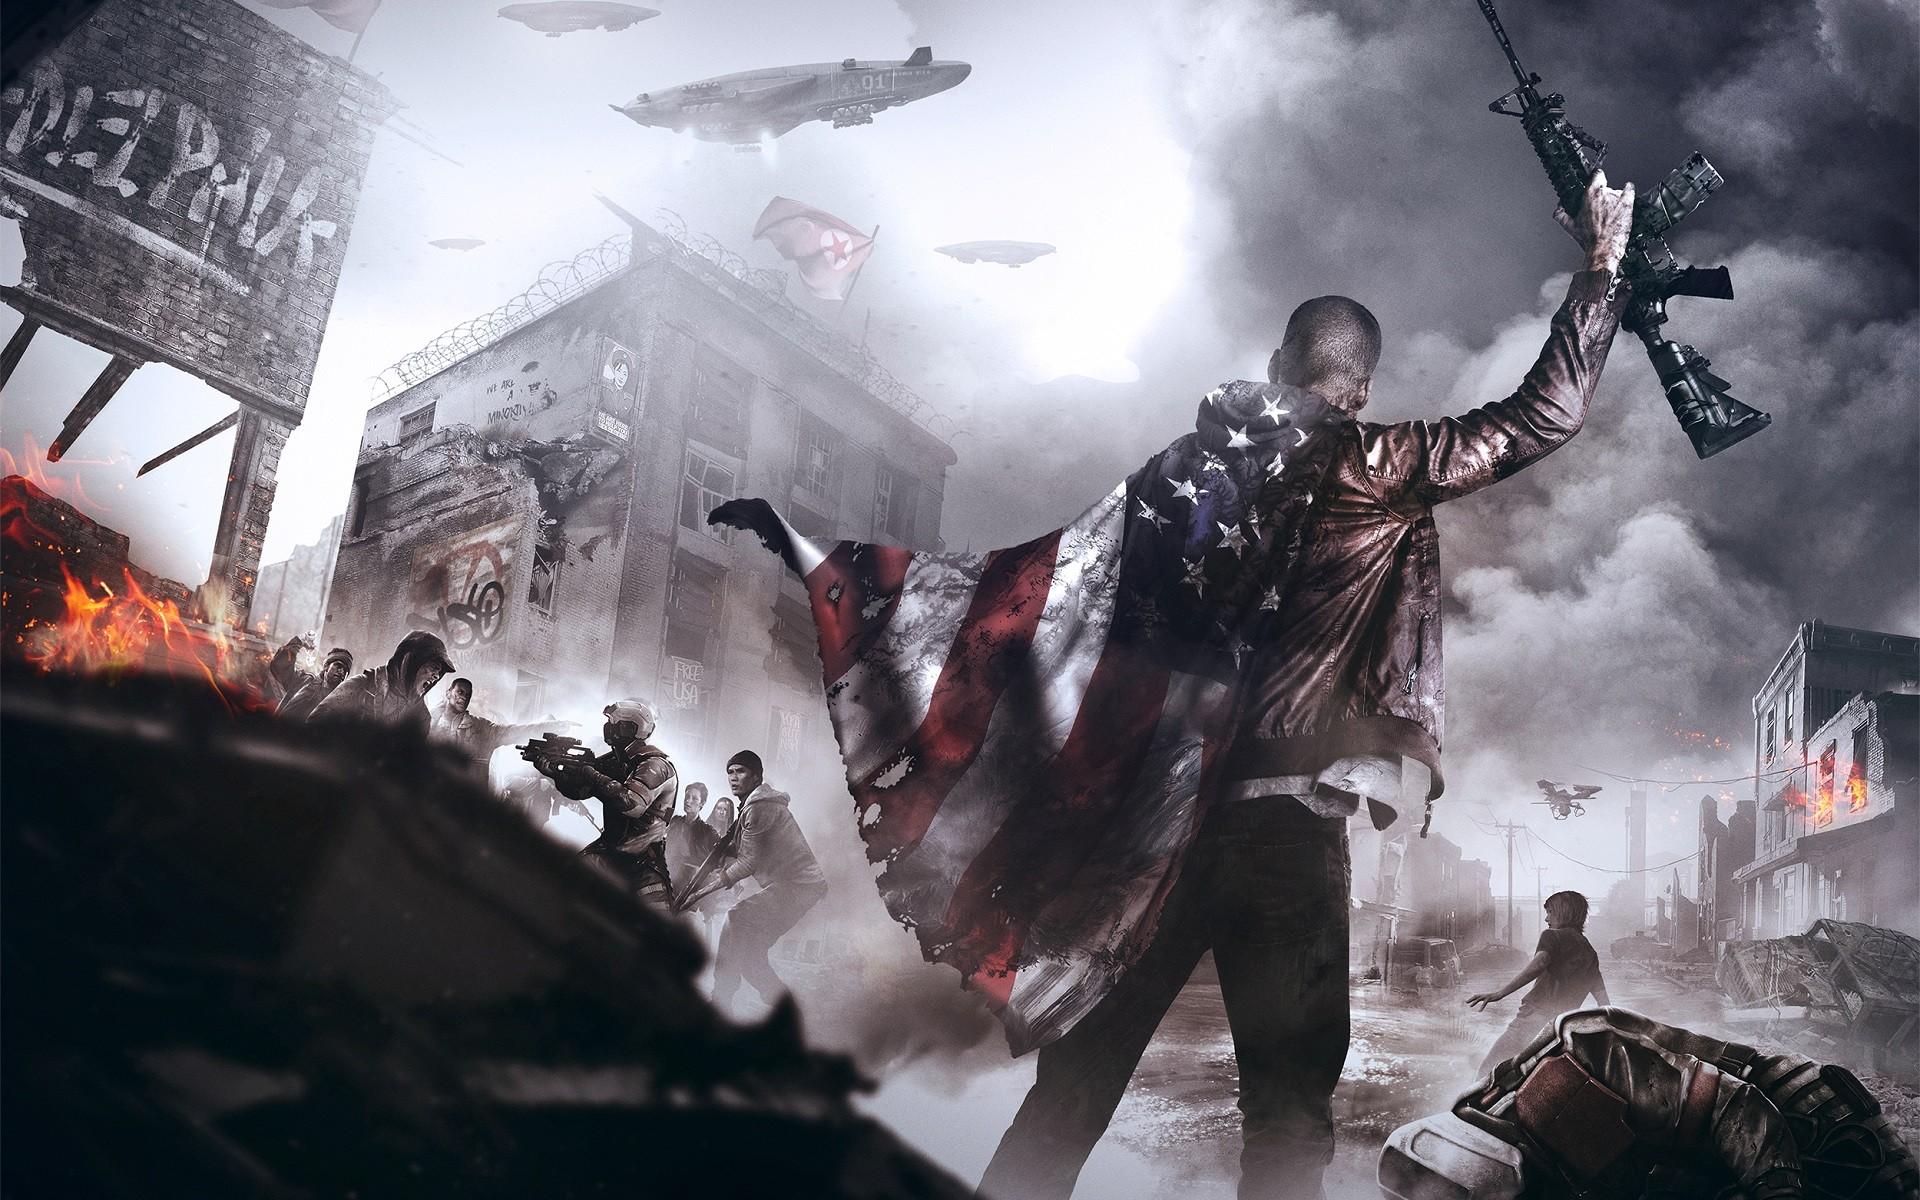 wallpaper video games weapon concept art american flag rh wallhere com